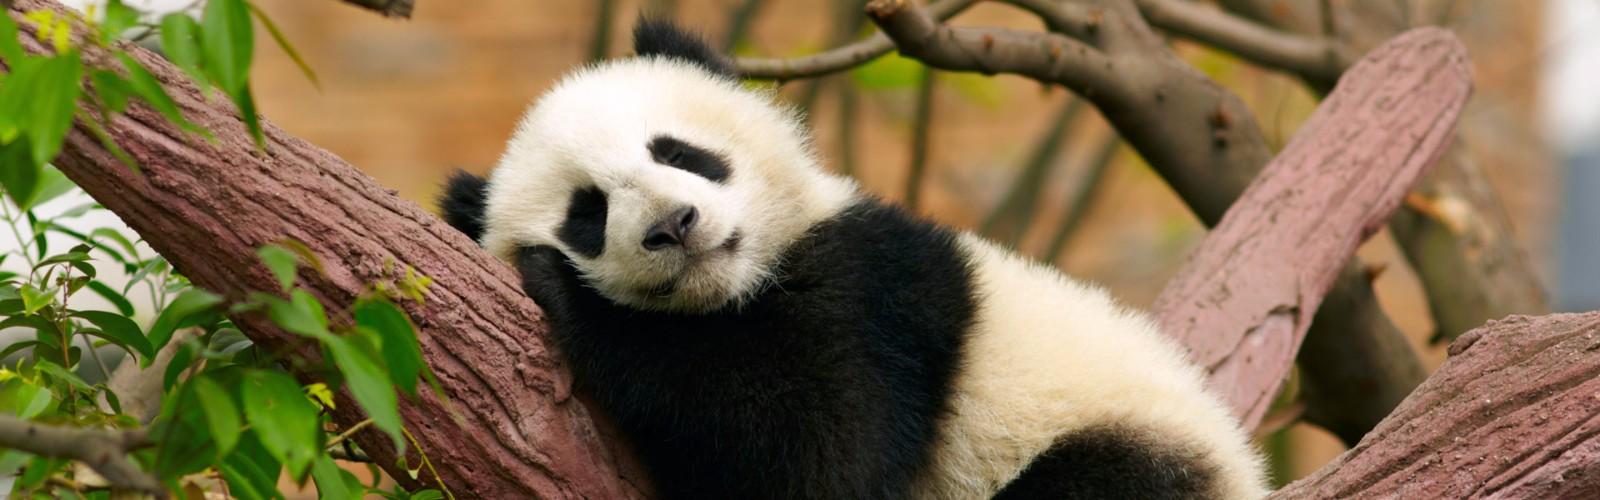 hight resolution of chongqing zoo and panda house